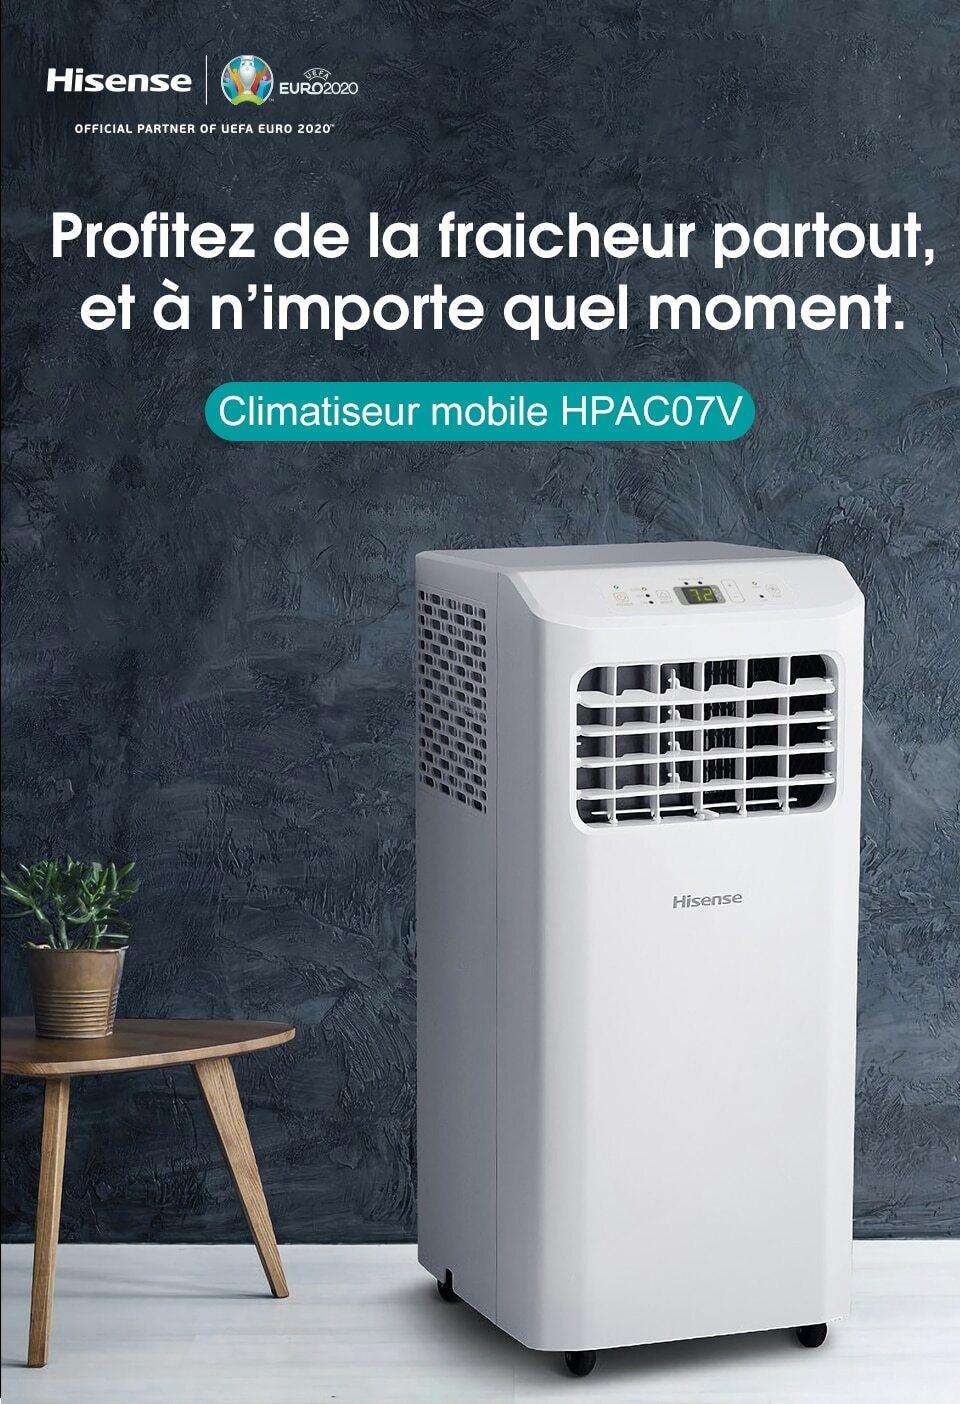 Hisense-climatiseur-mobile-HPAC07V-de-01.jpg